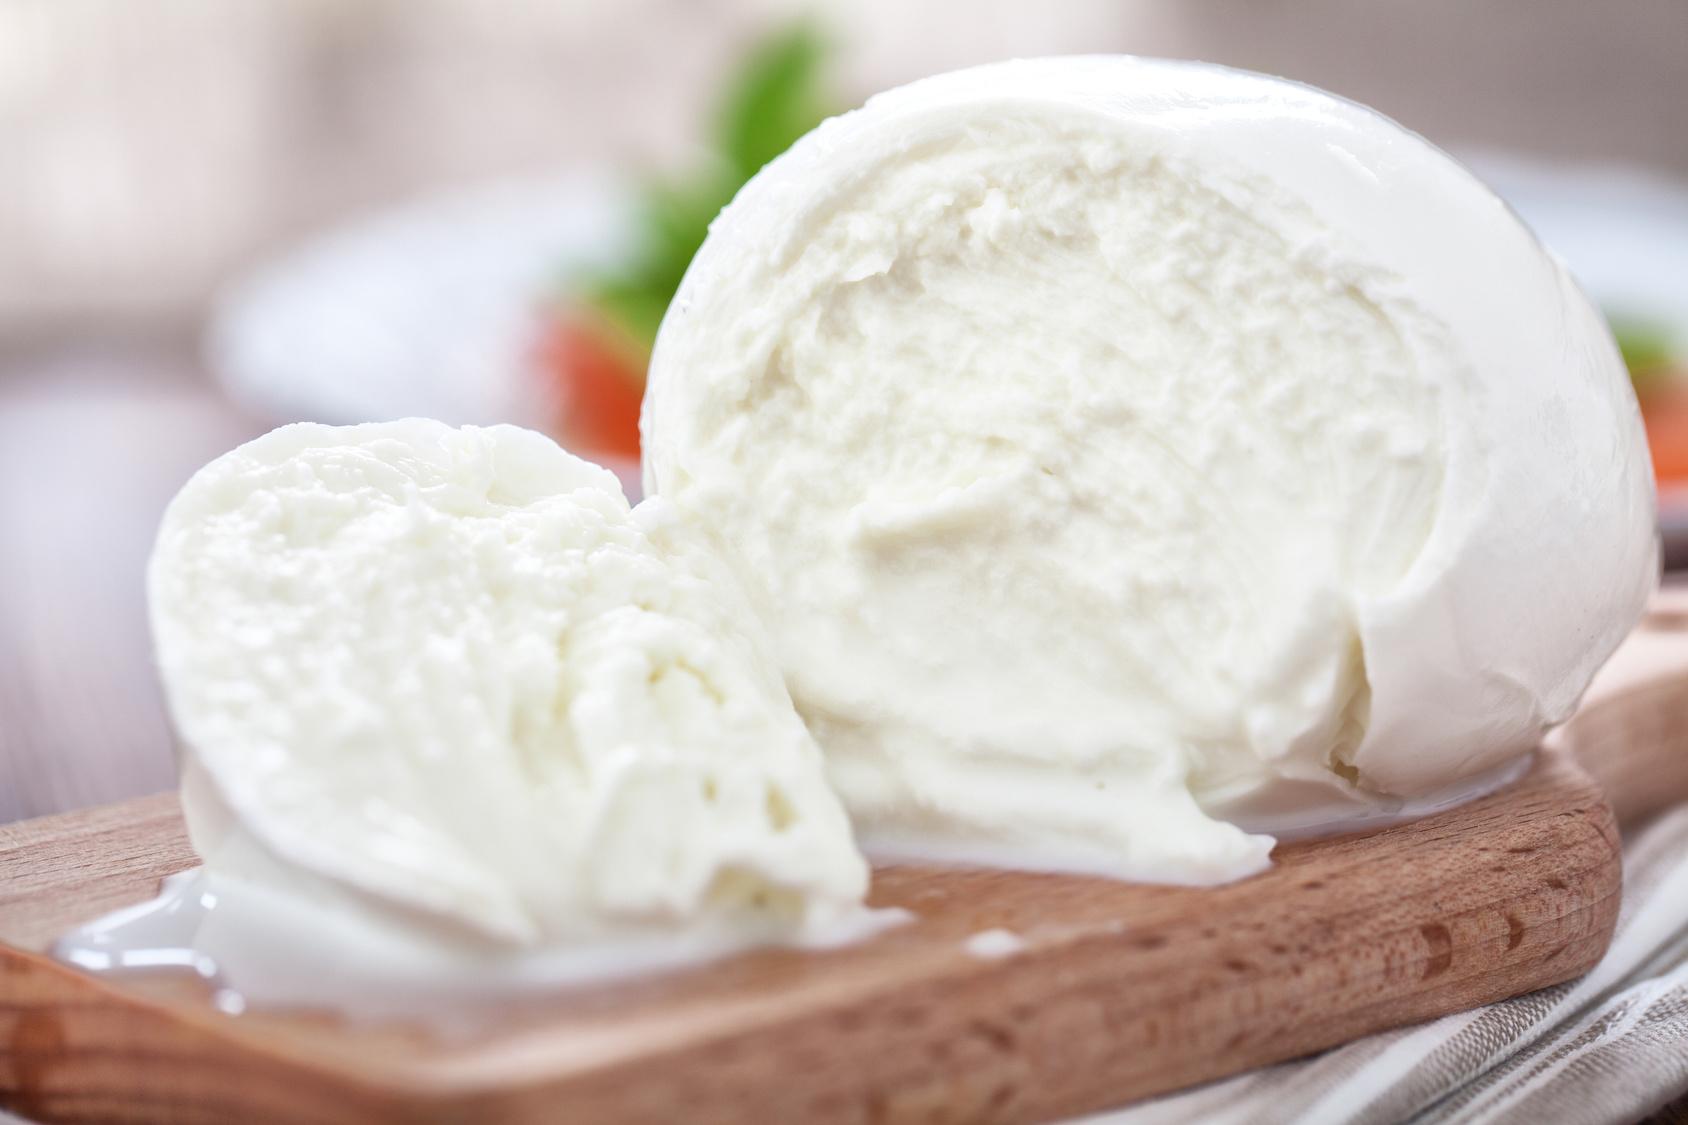 käse selber machen - mozzarella | rezepte | www.kaese-selber.de